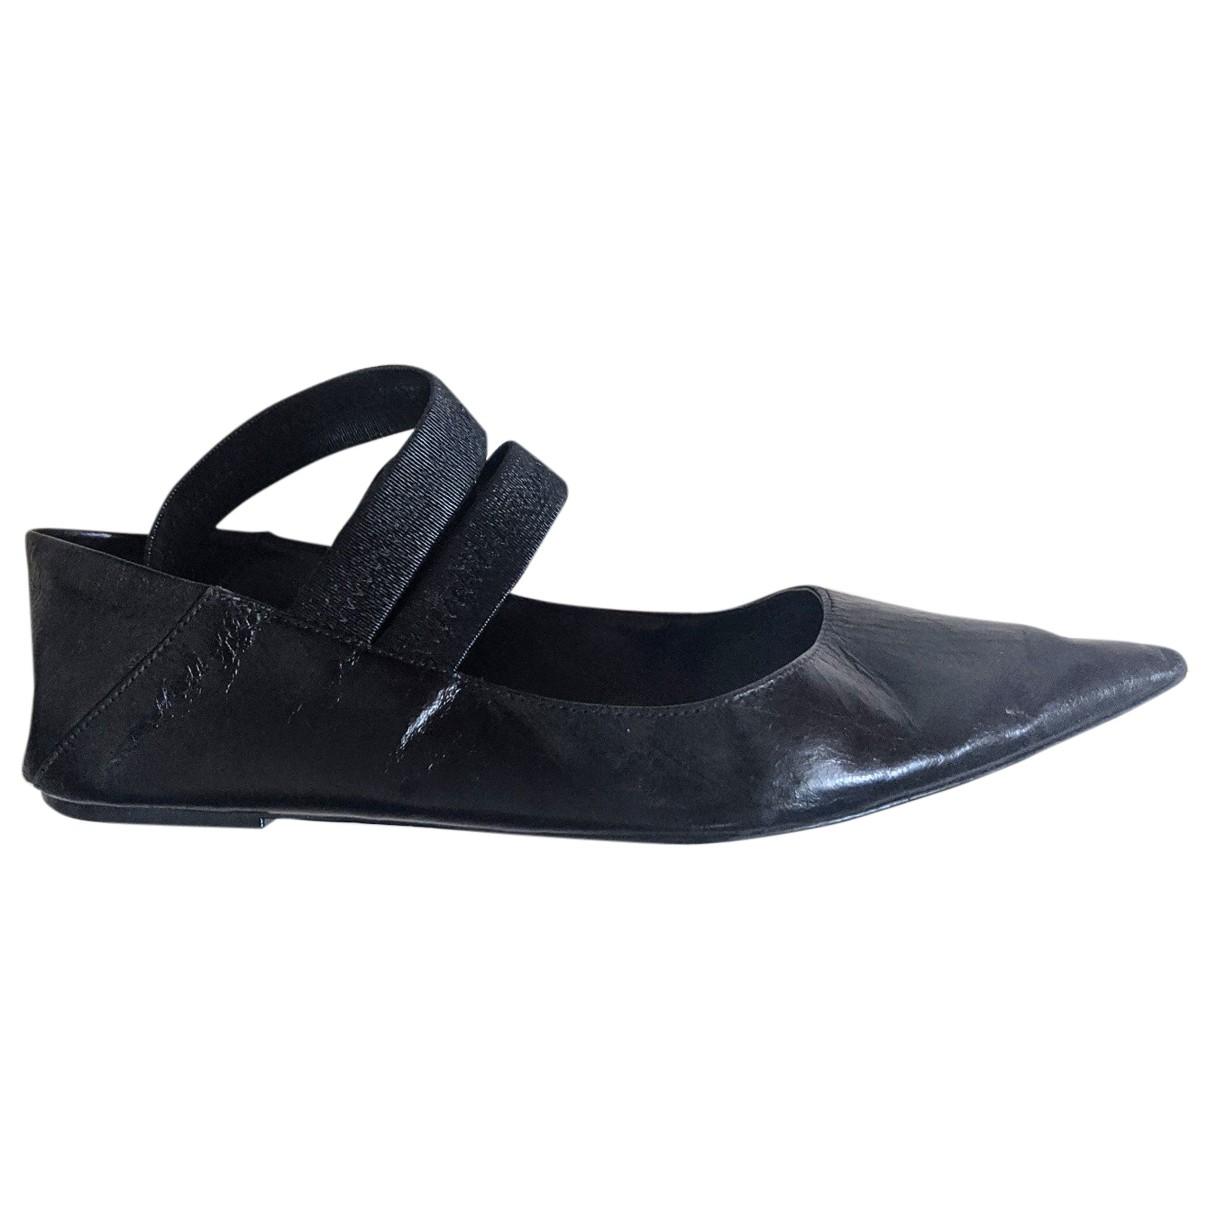 Zara \N Ballerinas in  Schwarz Leder